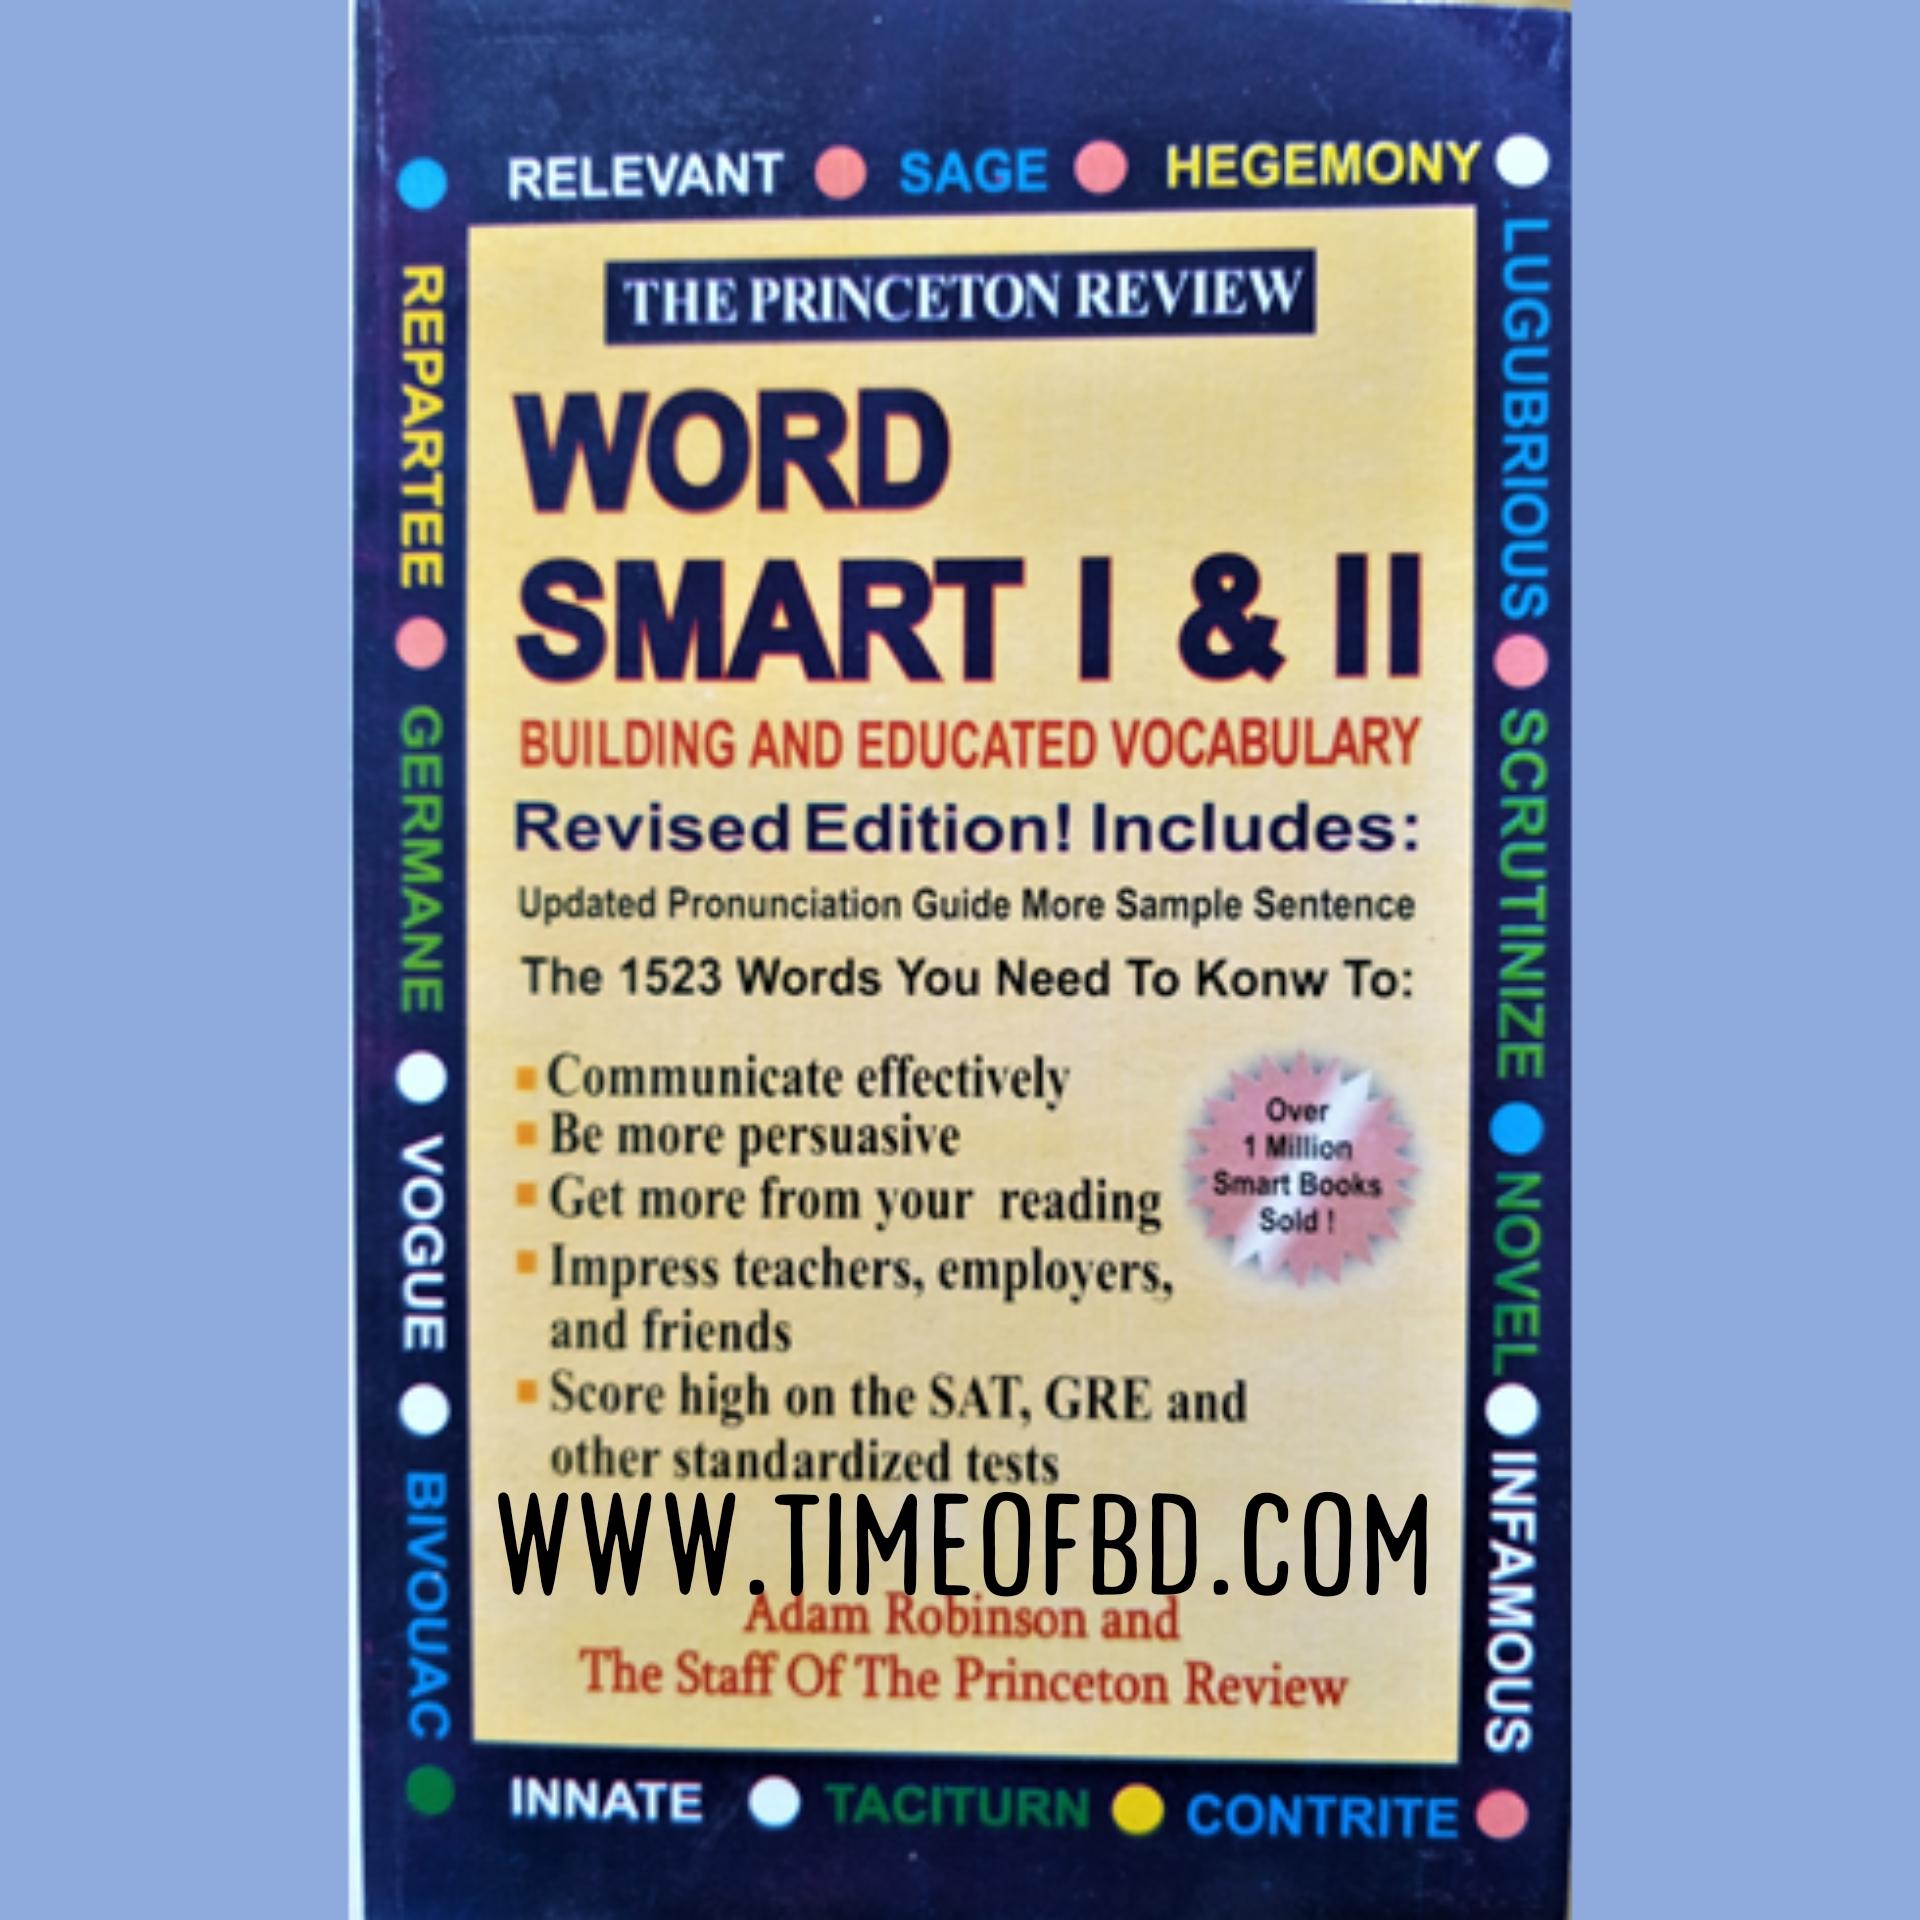 smart Book, Word Smart Book I & II, Word smart book price, Word online book pdf file, Word smart book online order link,ওয়ার্ড স্মার্ট বুক প্রাইস ইন বিডি